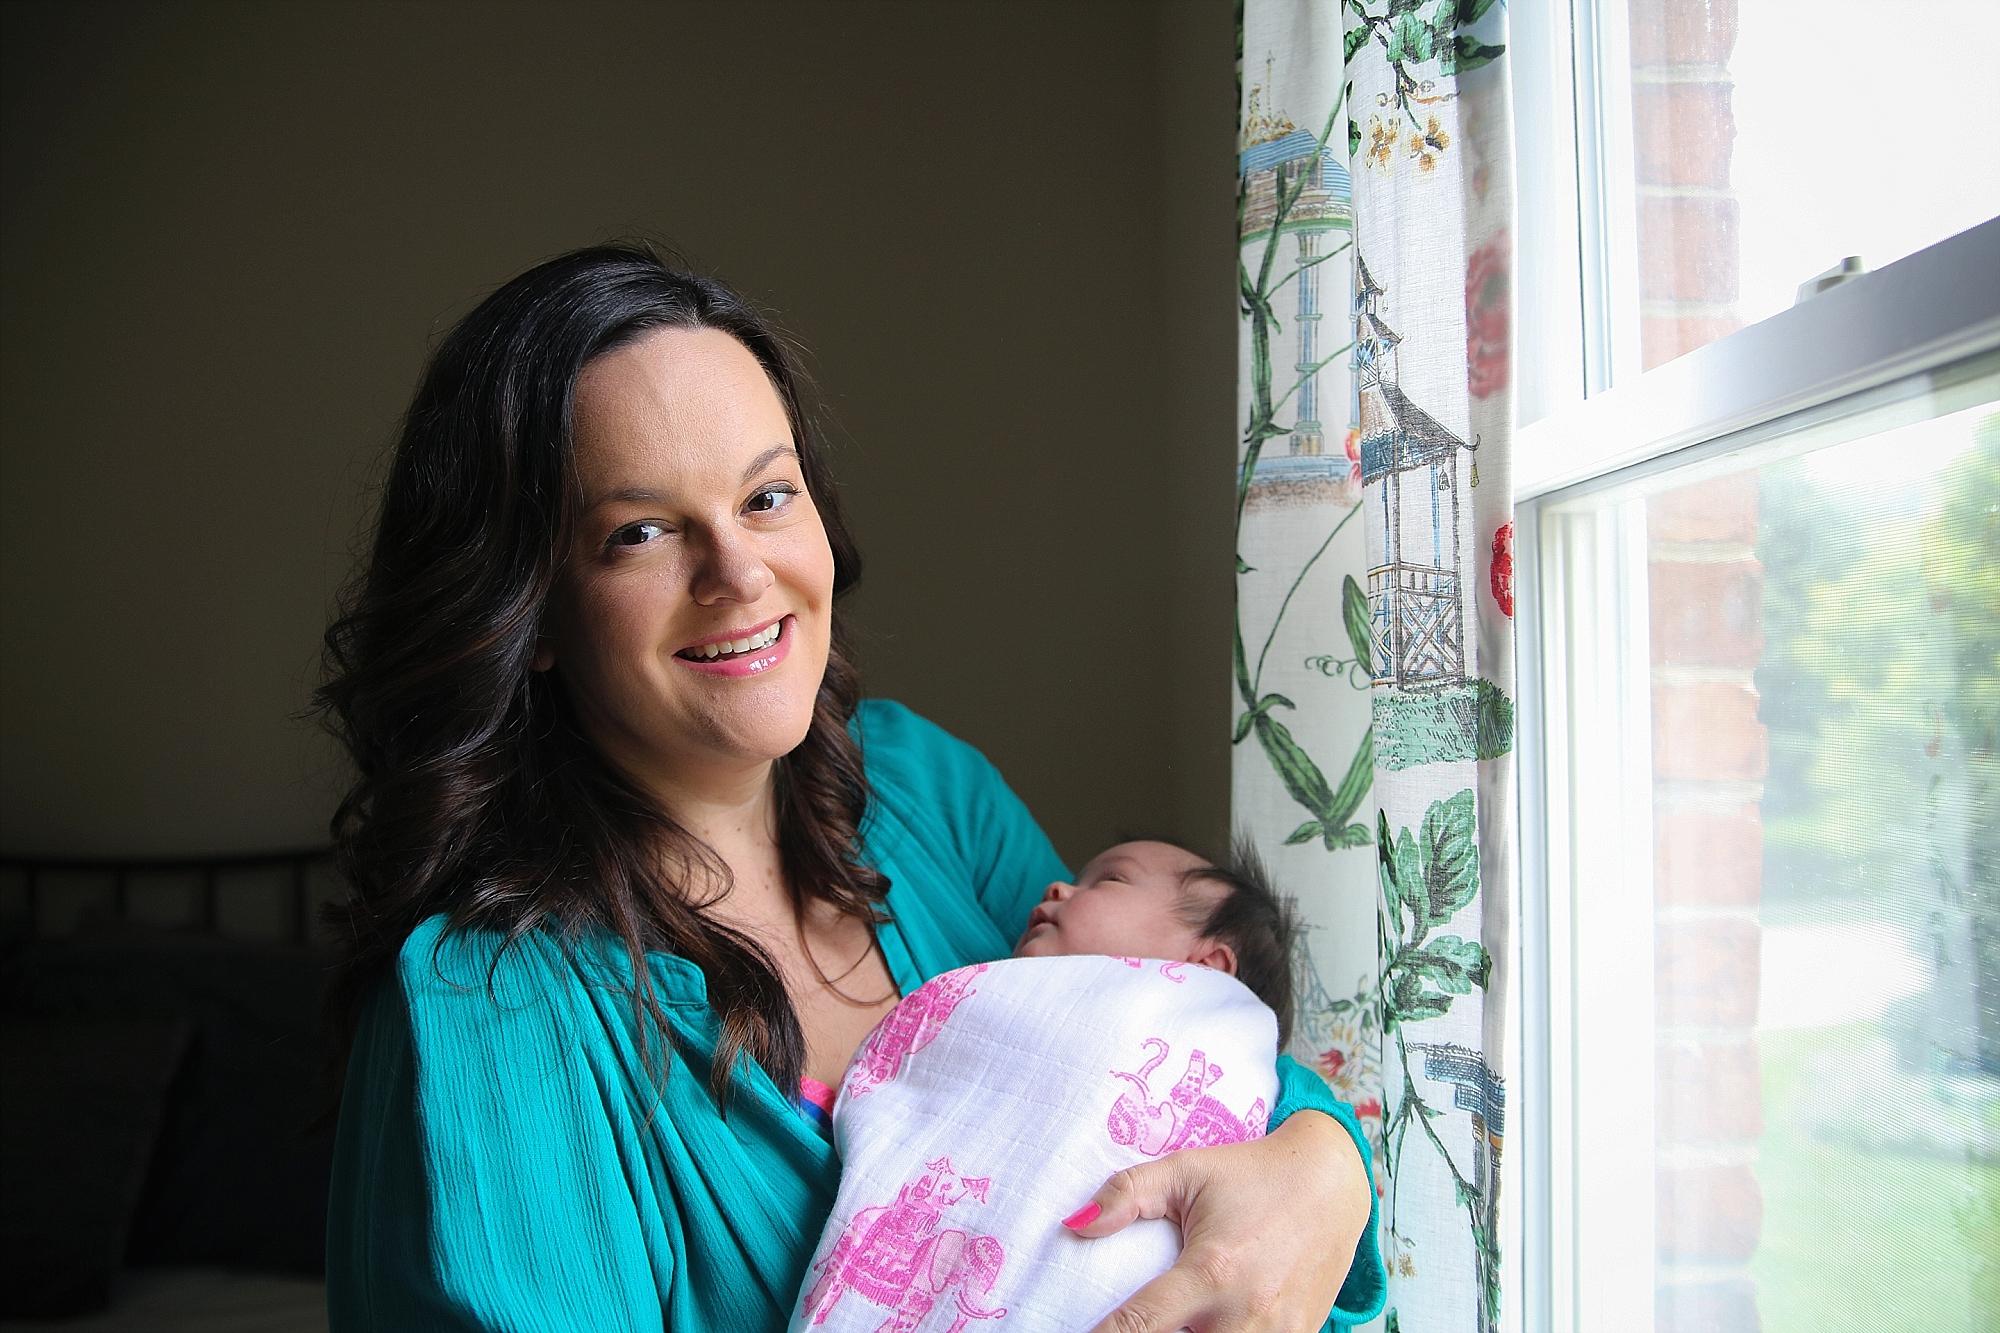 Blacksburg, Virginia Newborn Portrait Photography by Holly Cromer, Photographer